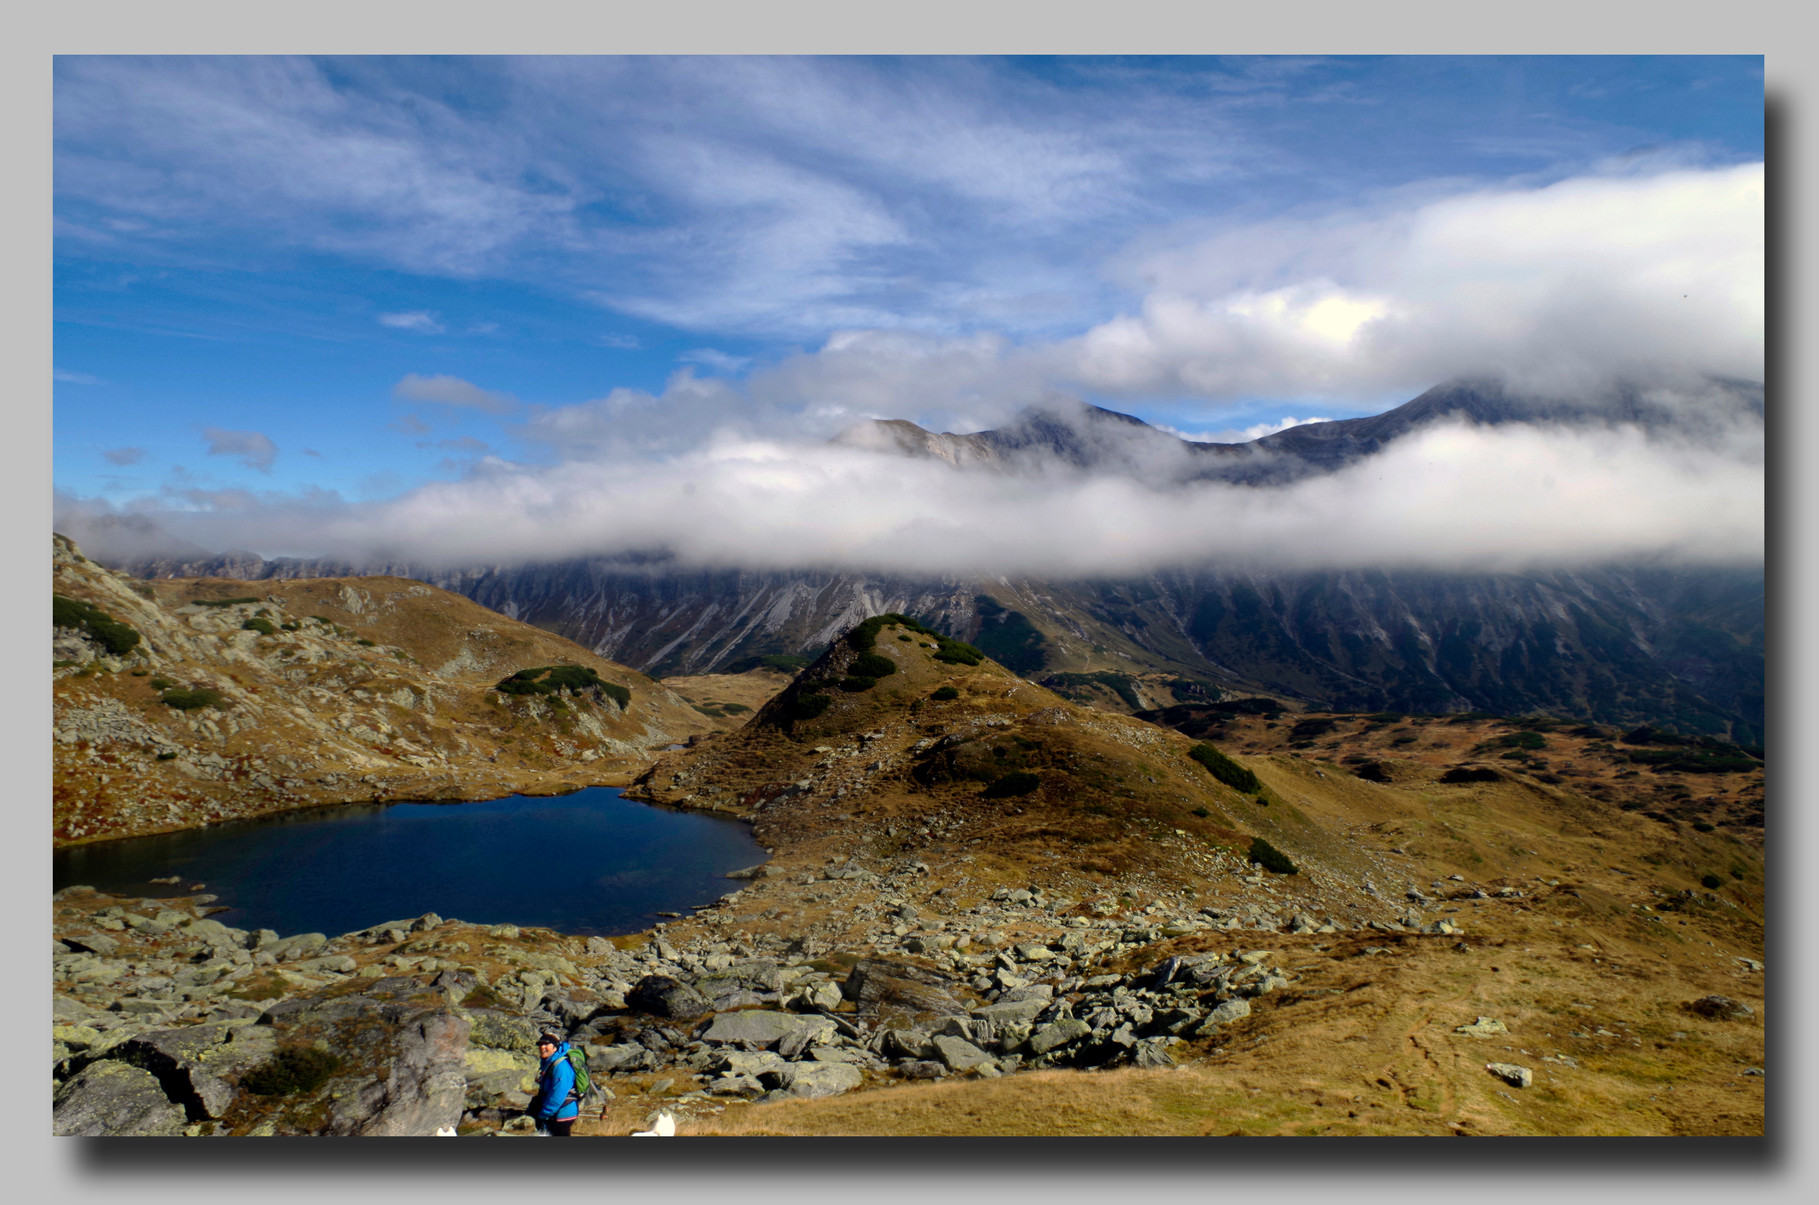 Wunderschönes Bergpanorama